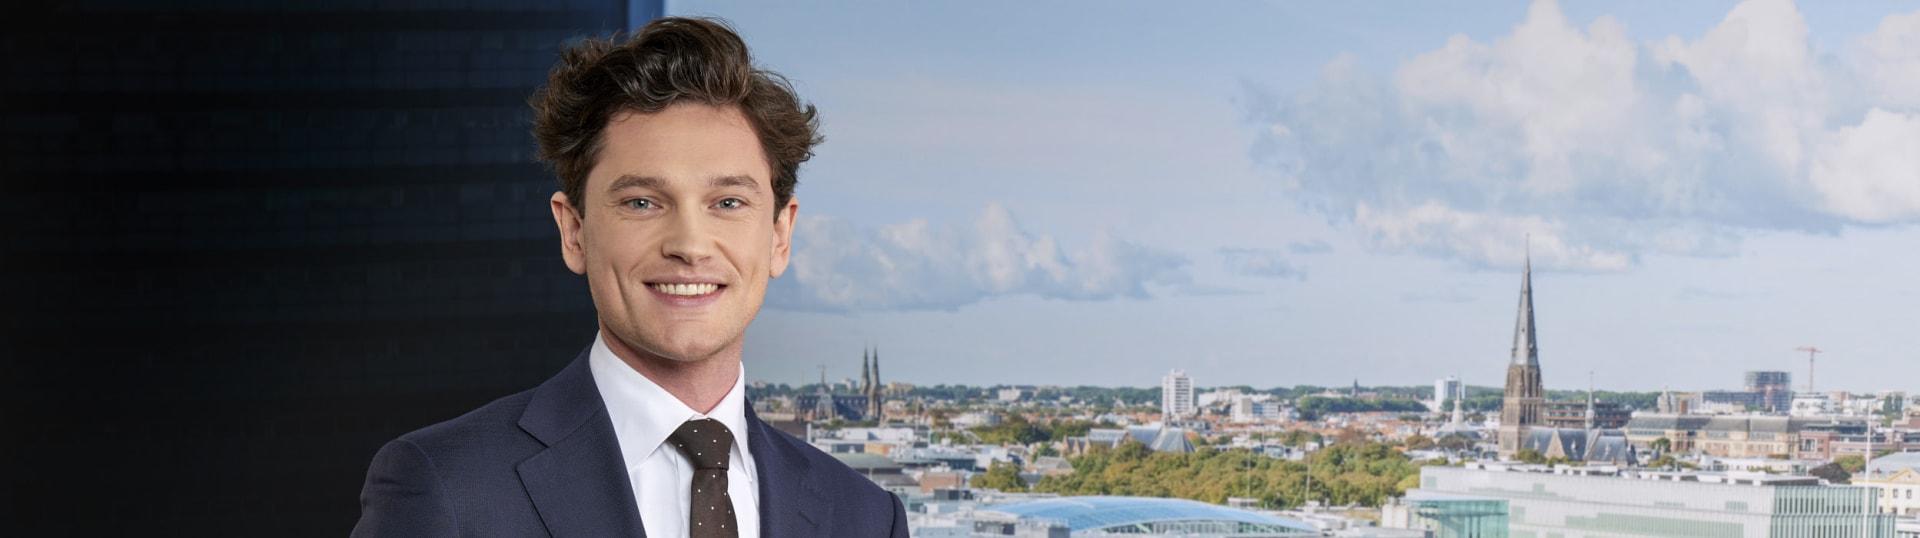 Jan Bakker, advocaat Pels Rijcken